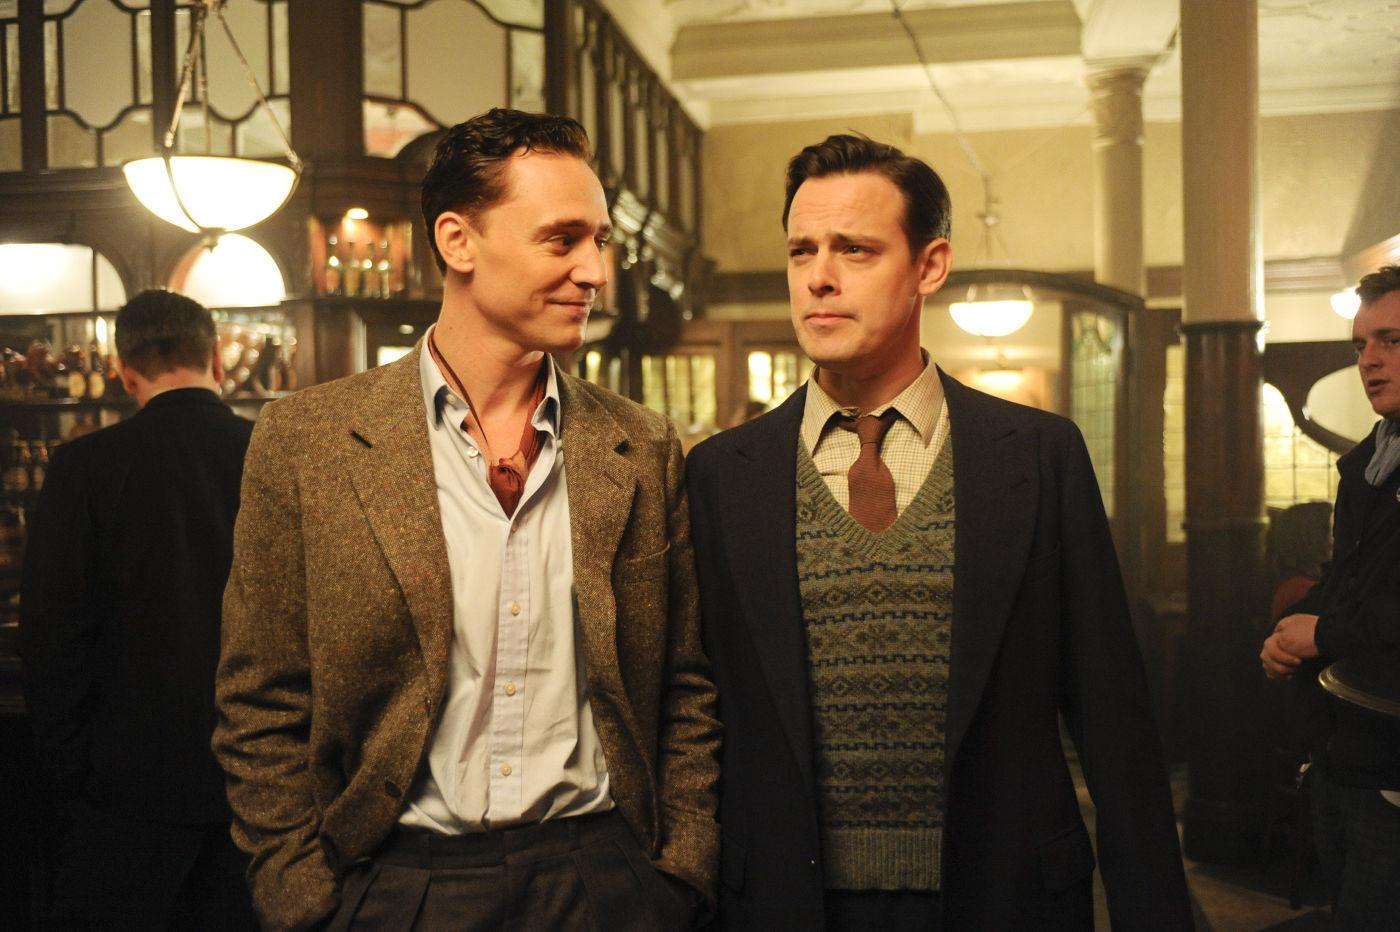 The Deep Blue Sea Movie Stills - Tom Hiddleston Image (26445571) - Fanpop